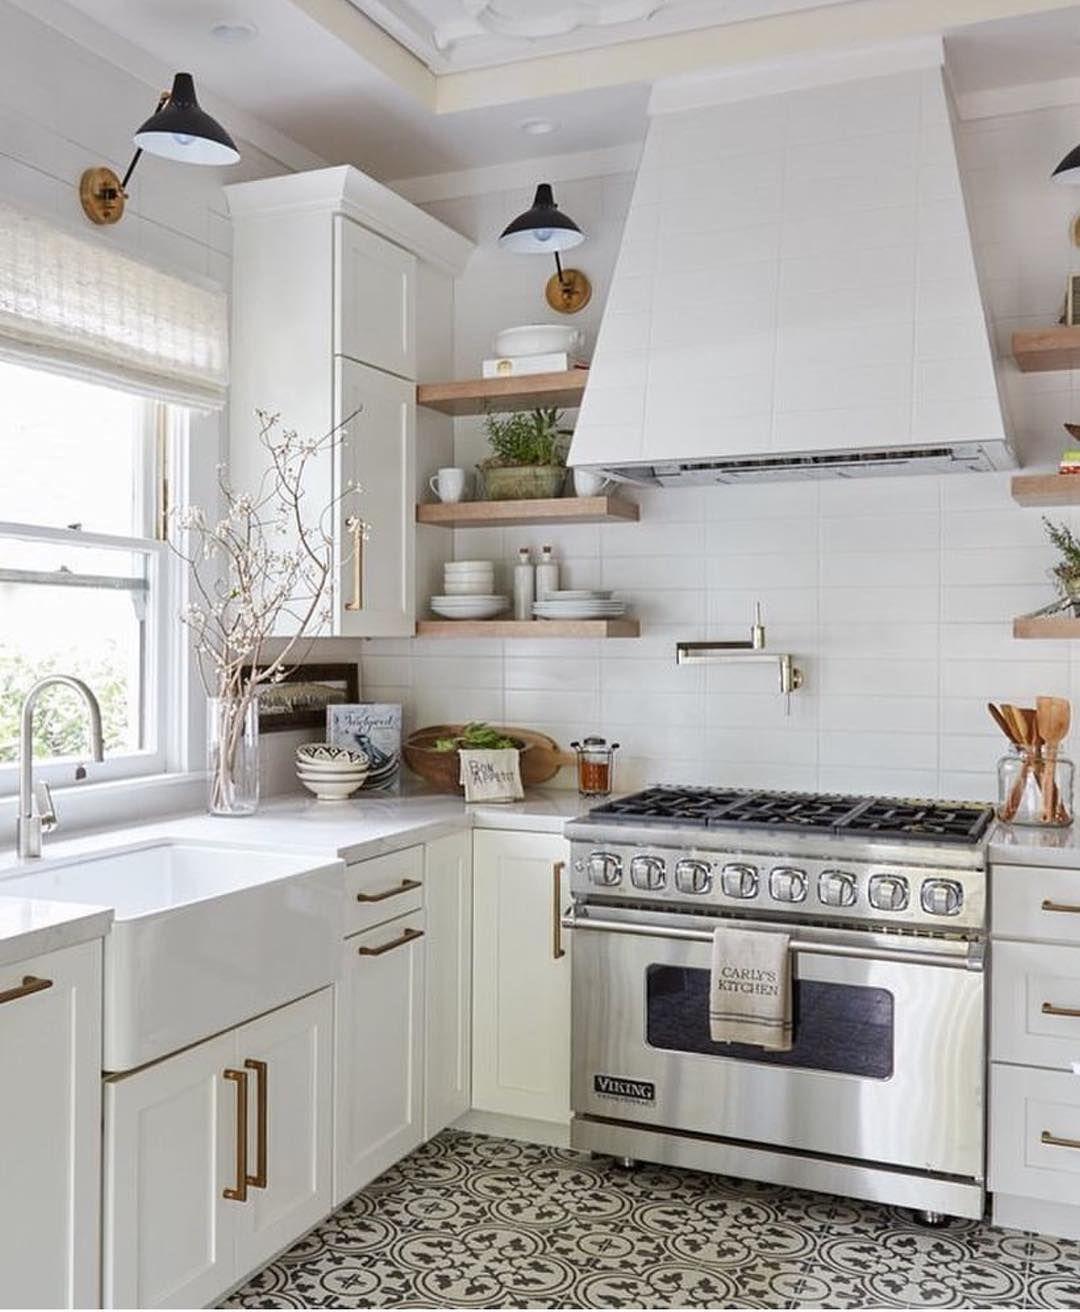 Pin by Elif Elisabet Senkal on kitchen | Pinterest | Kitchens ...